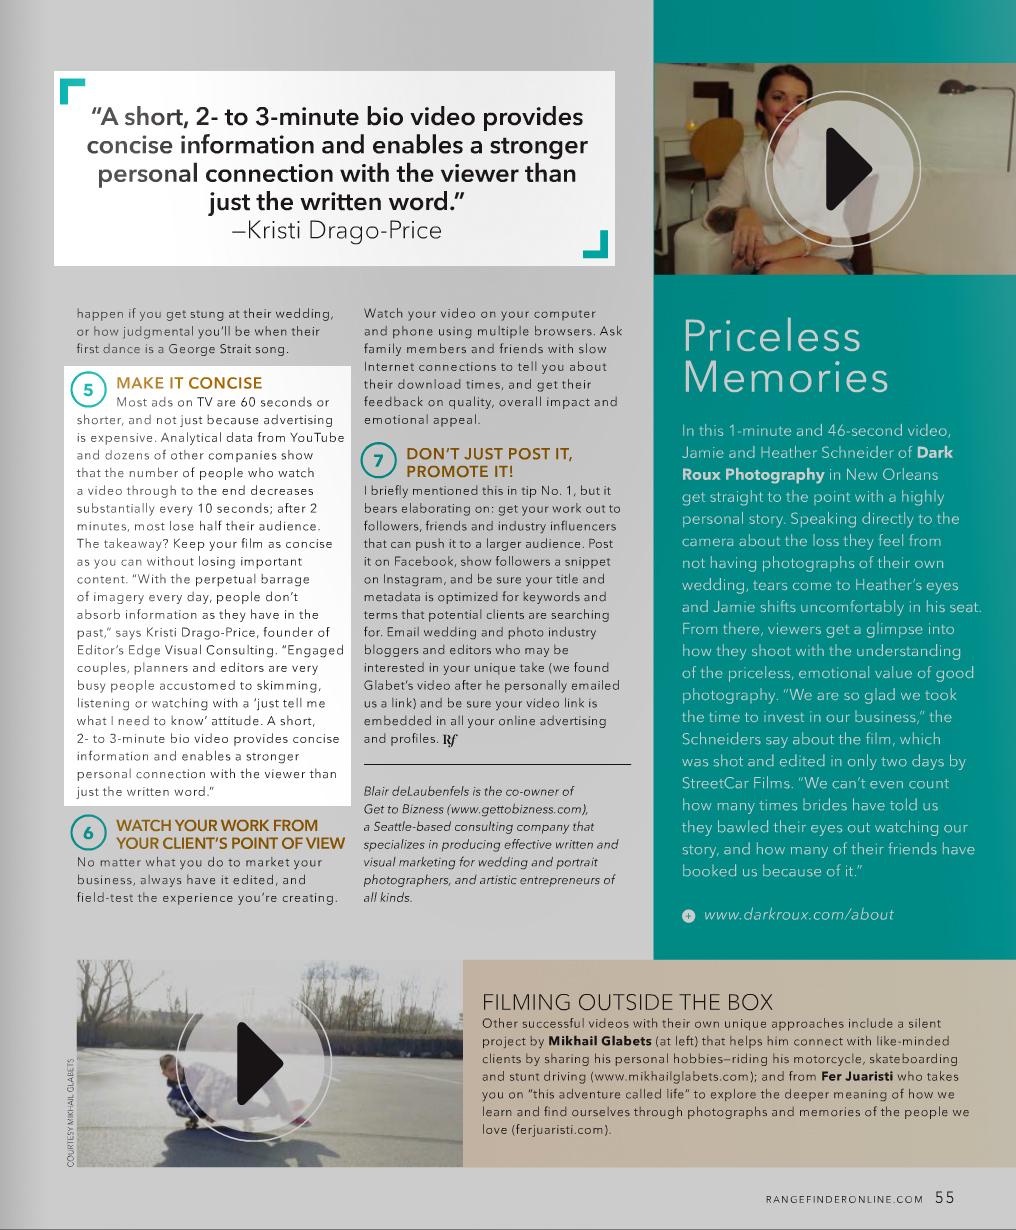 Kristi Drago-Price featured in Rangefinder Magazine | Editor's Edge